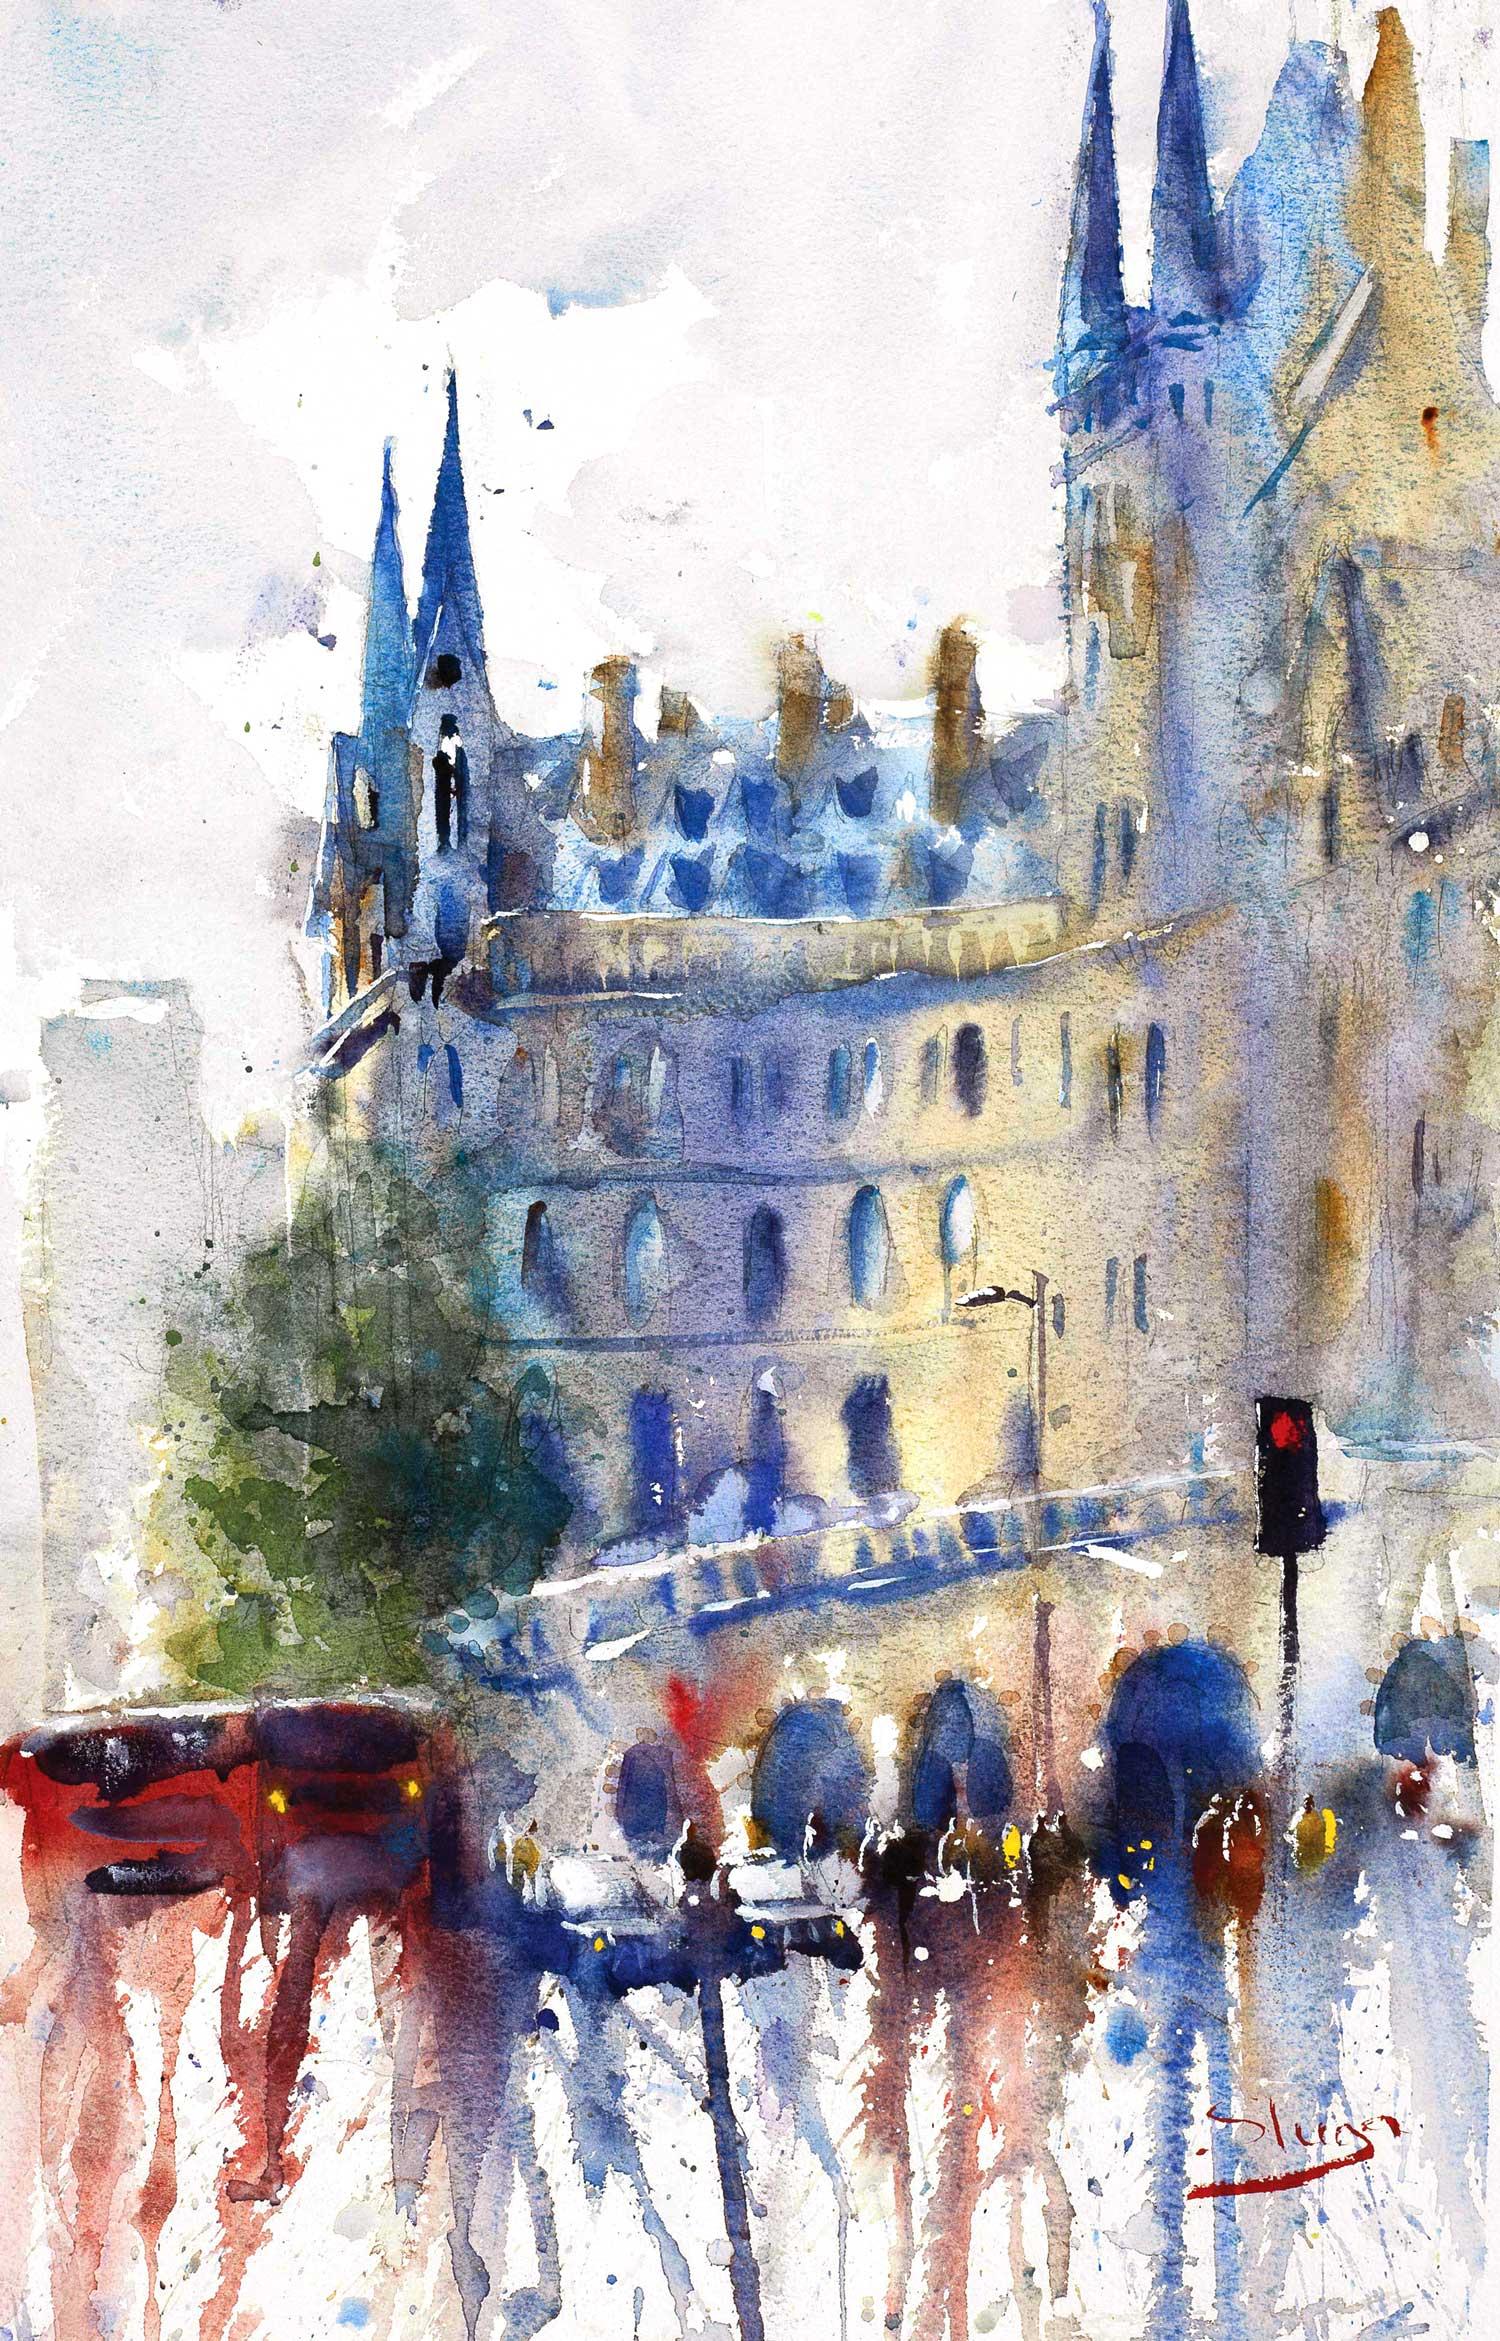 St Pancras 35 x 54 cm (Featured on recent London APV Film)